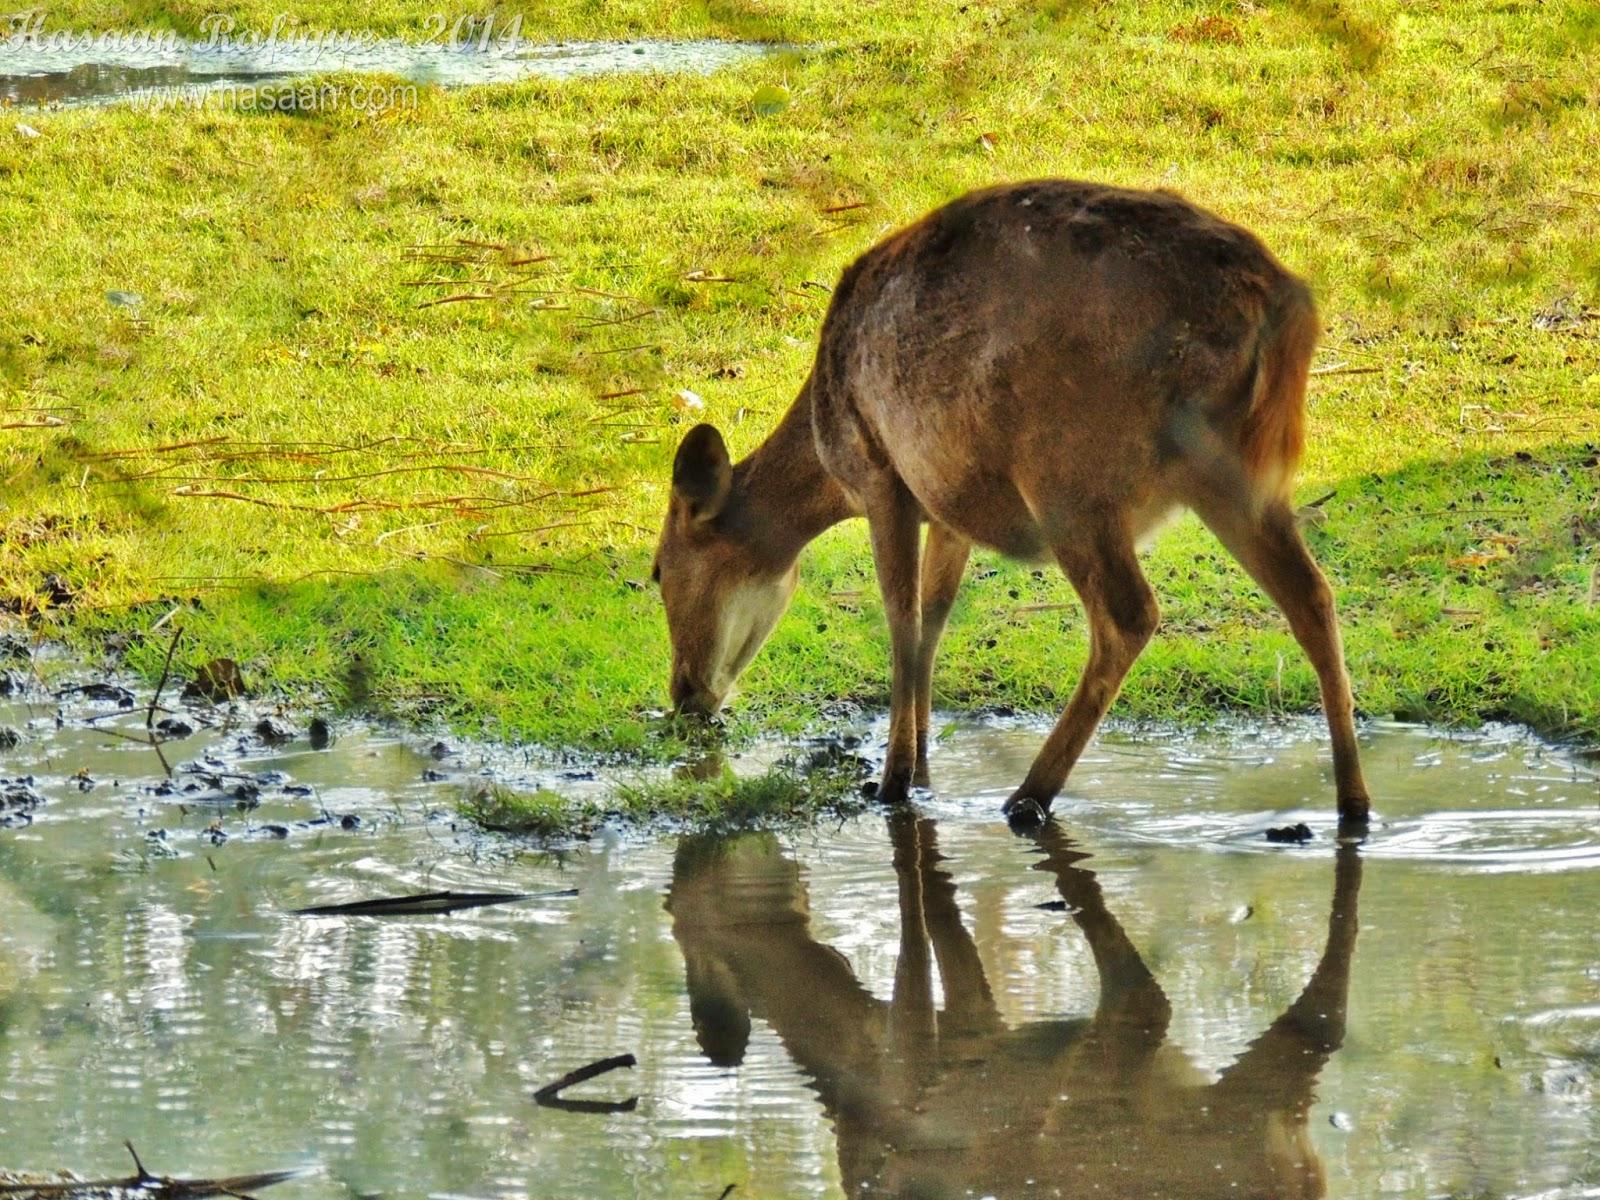 A deer drinking water.